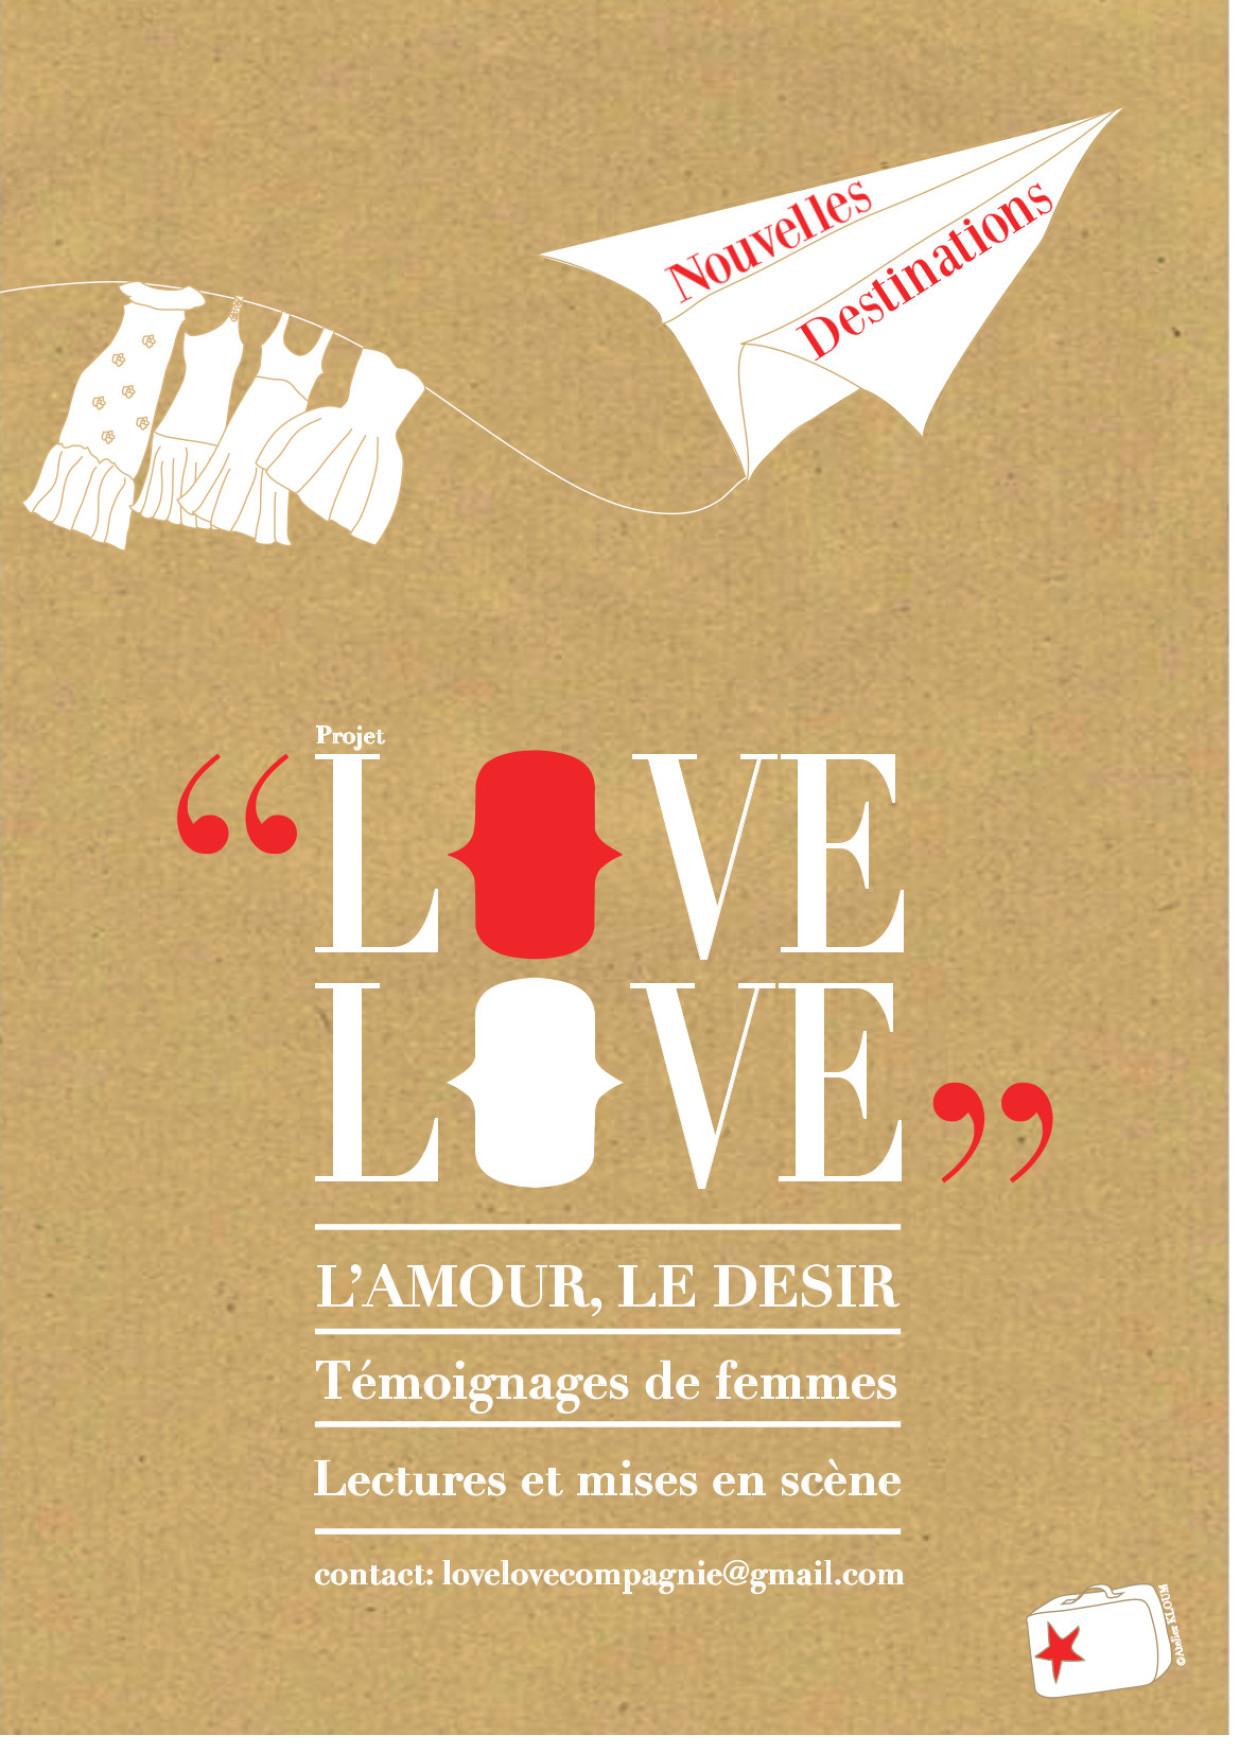 THÉÂTRE «LOVE LOVE » SAMEDI 17 FÉVRIER